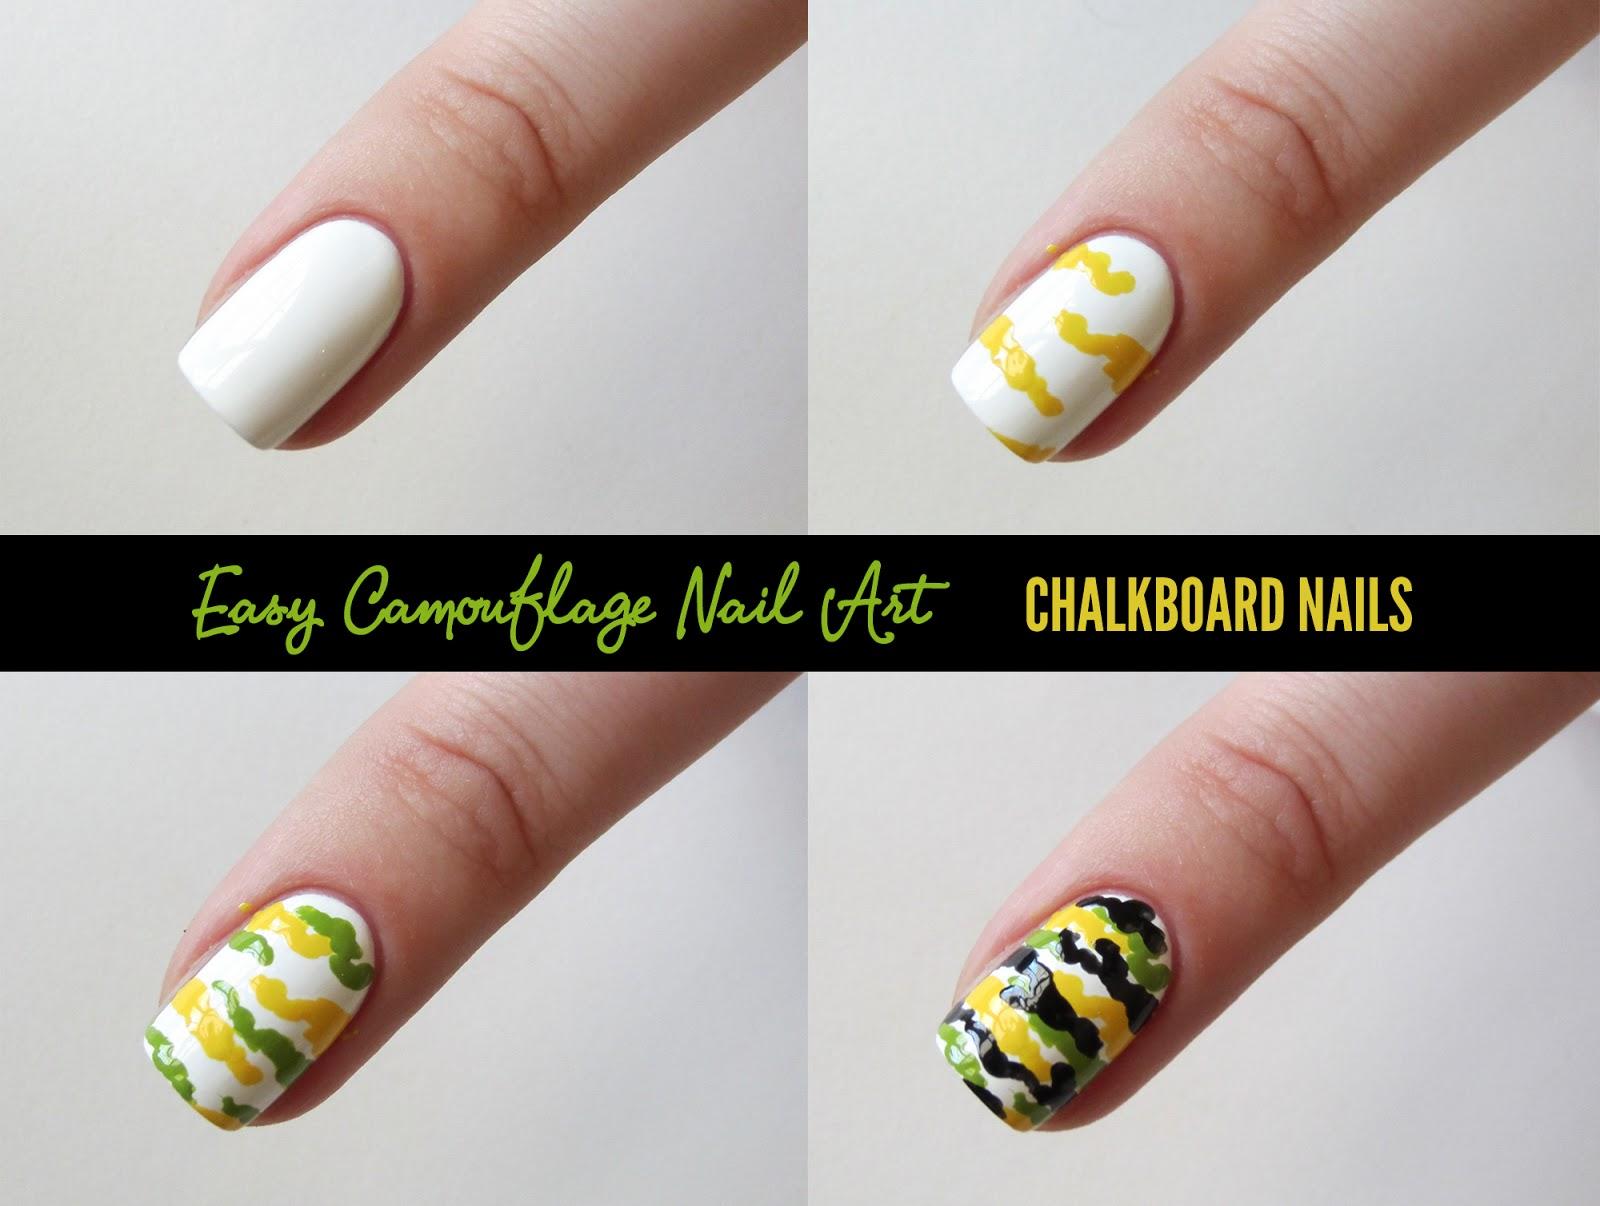 Chalkboard Nails Camouflage Nail Art Tutorial